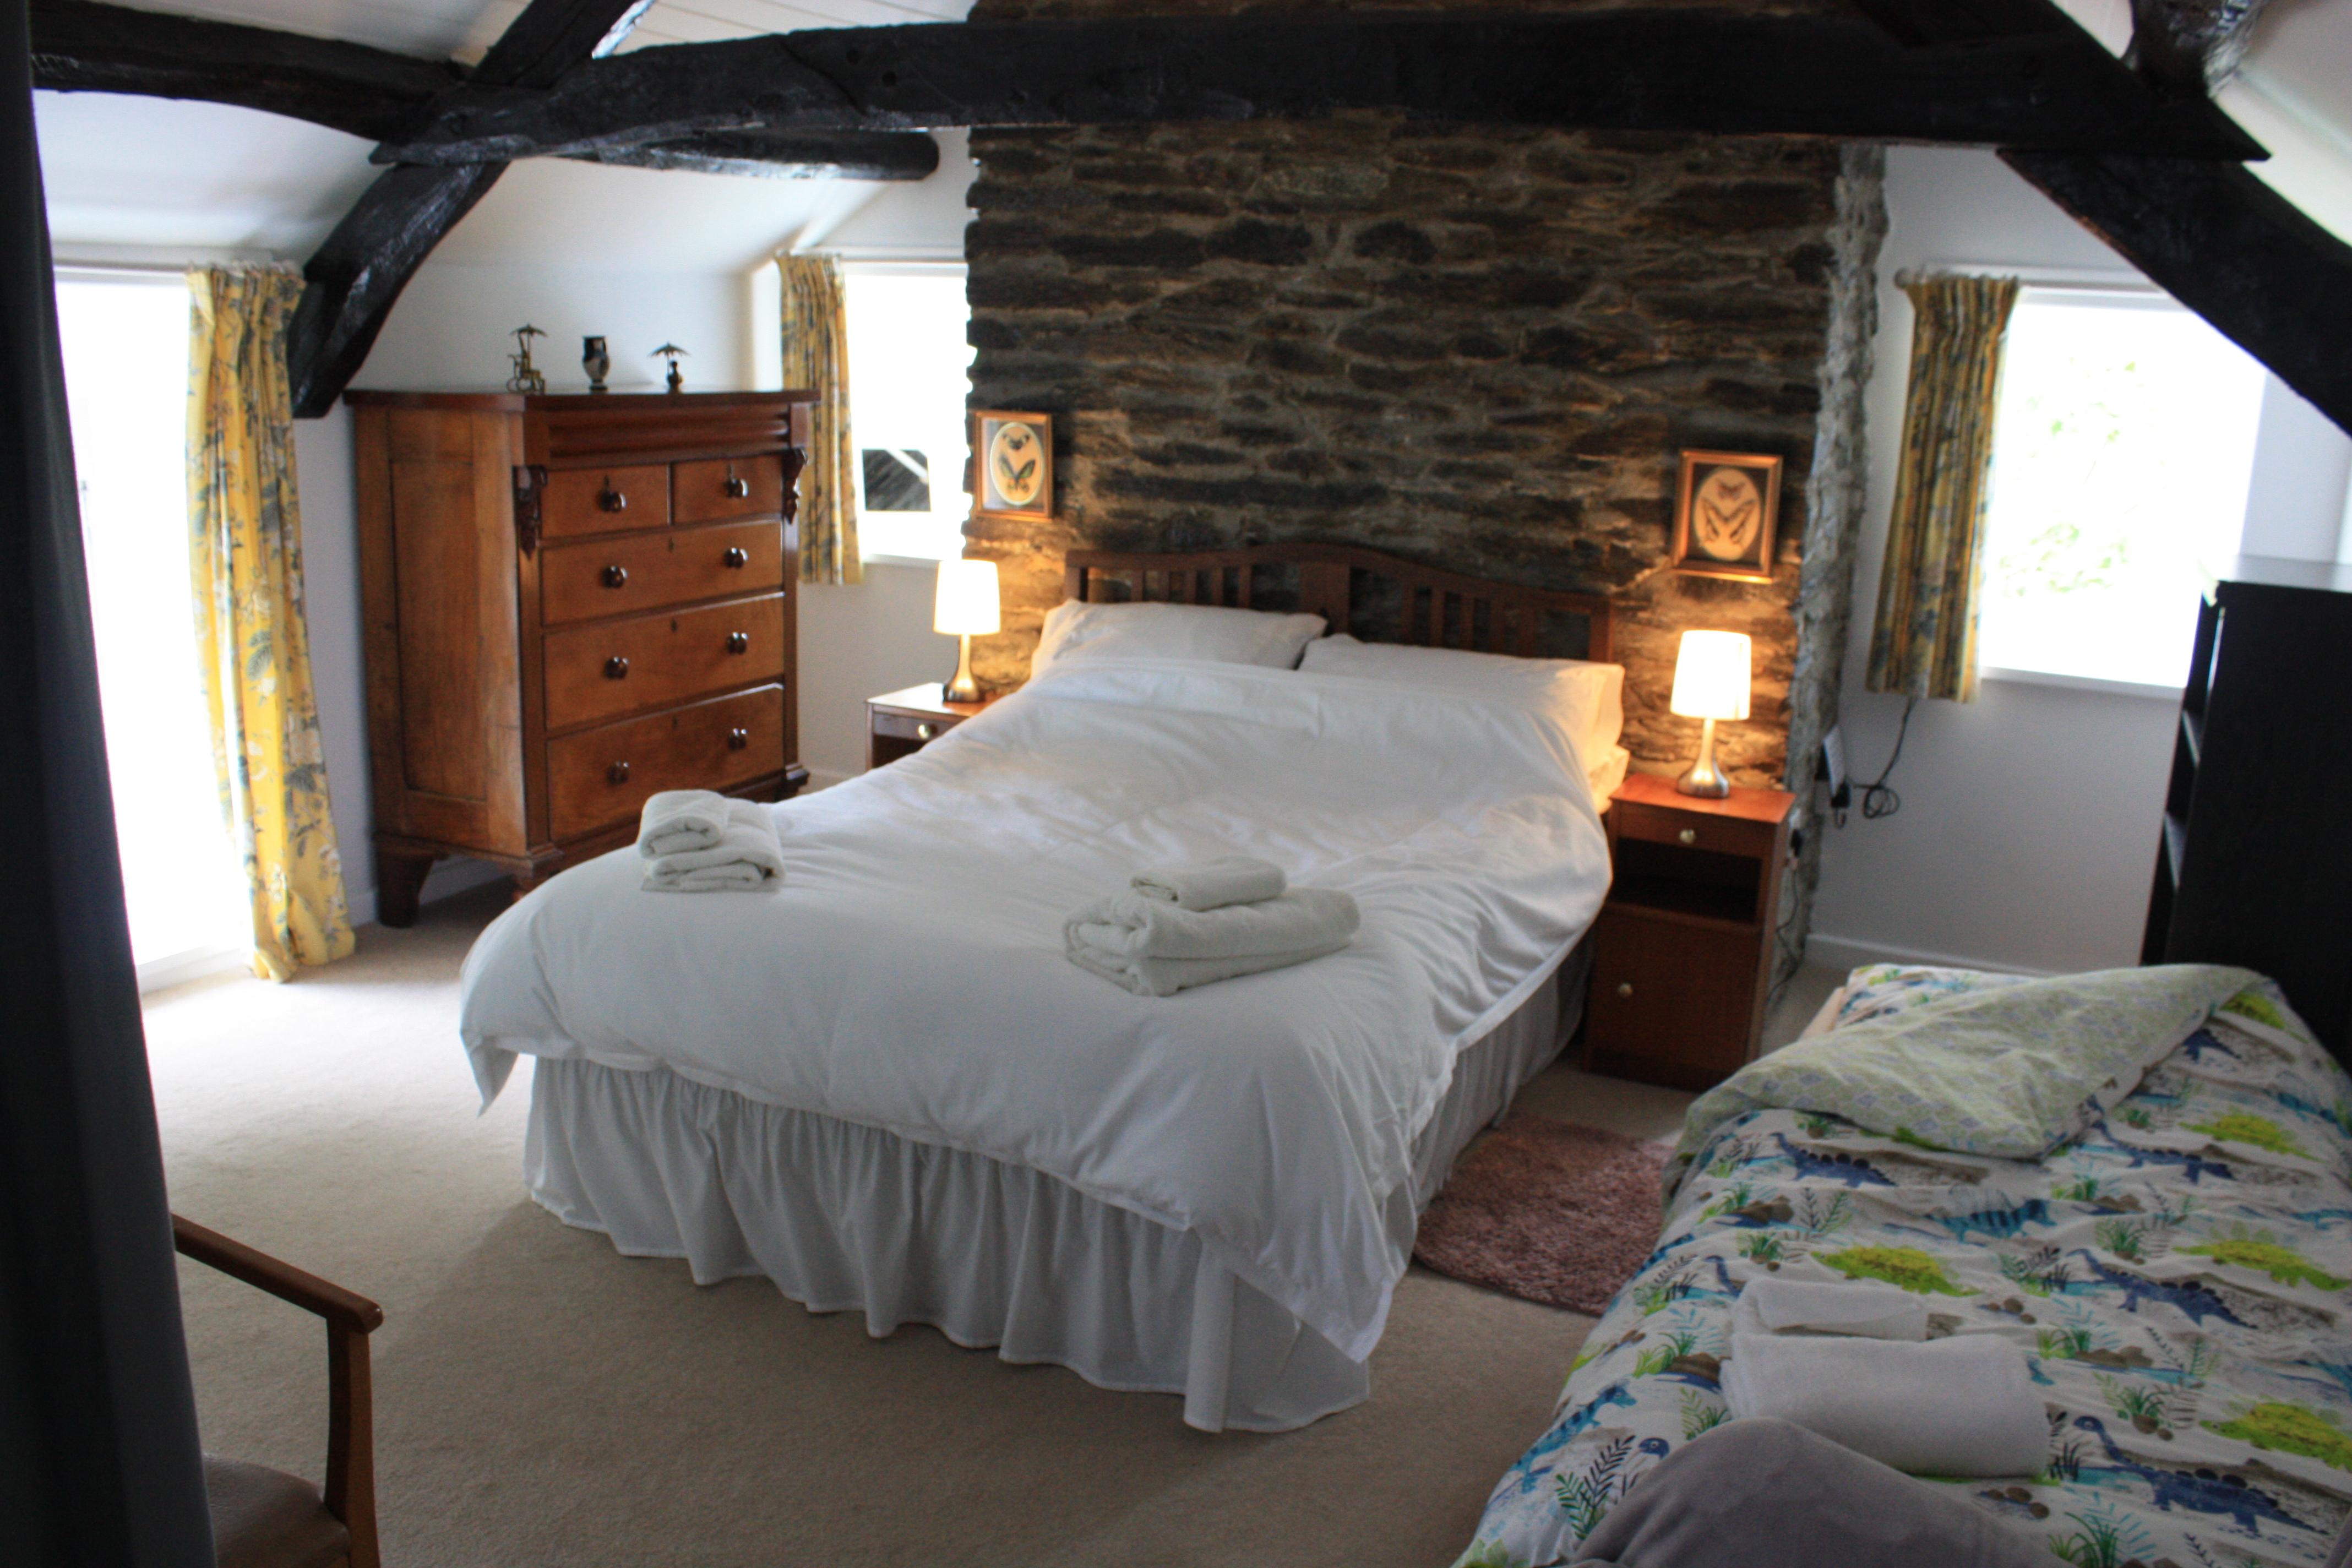 Bedroom, with original beams at The Old Vicarage, Llangeler